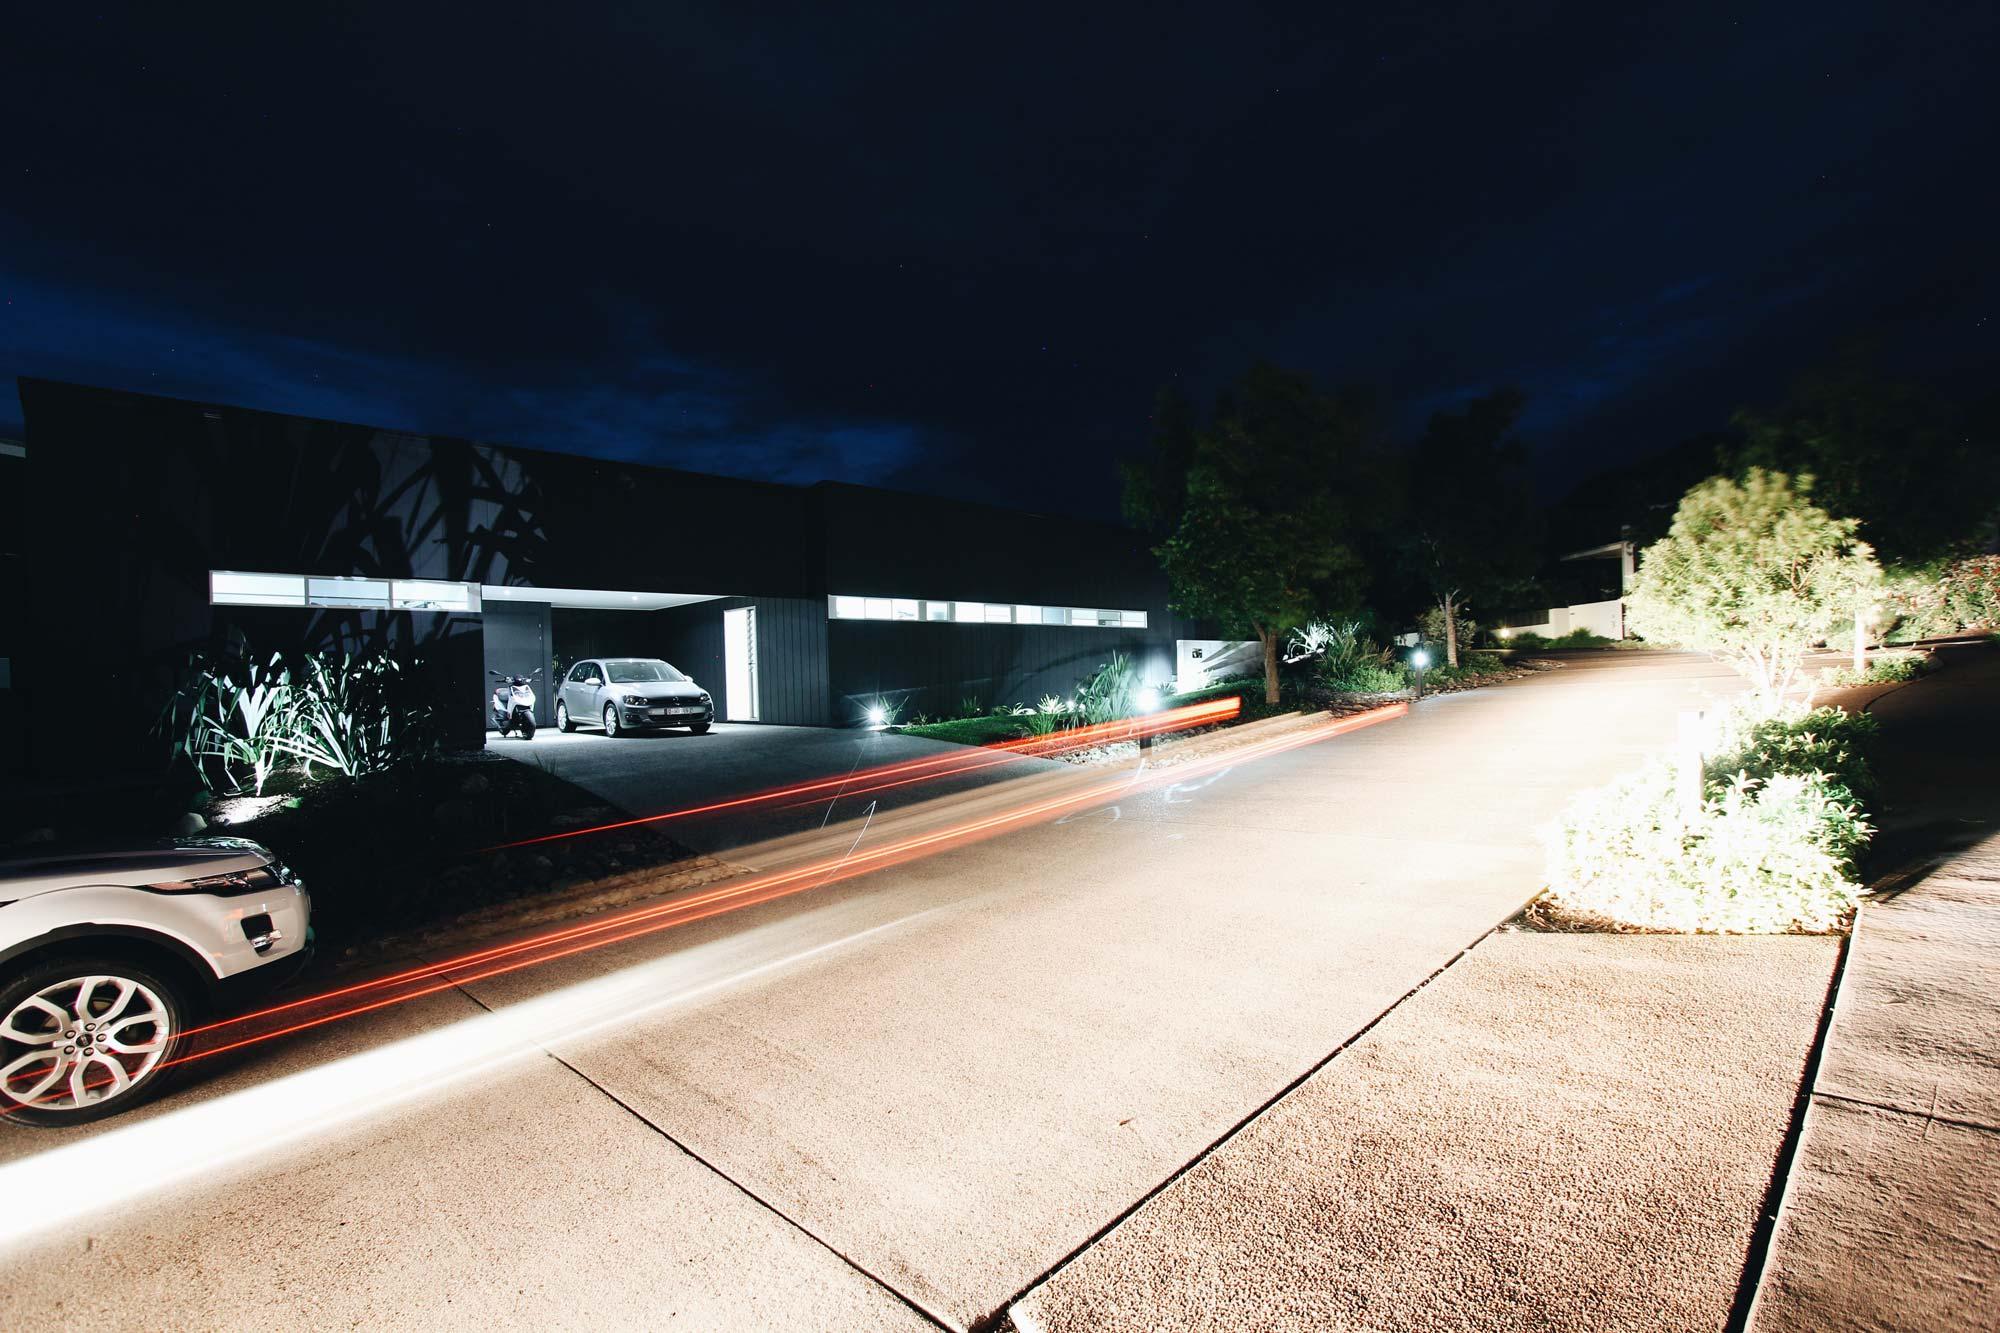 VK House - Driveway night